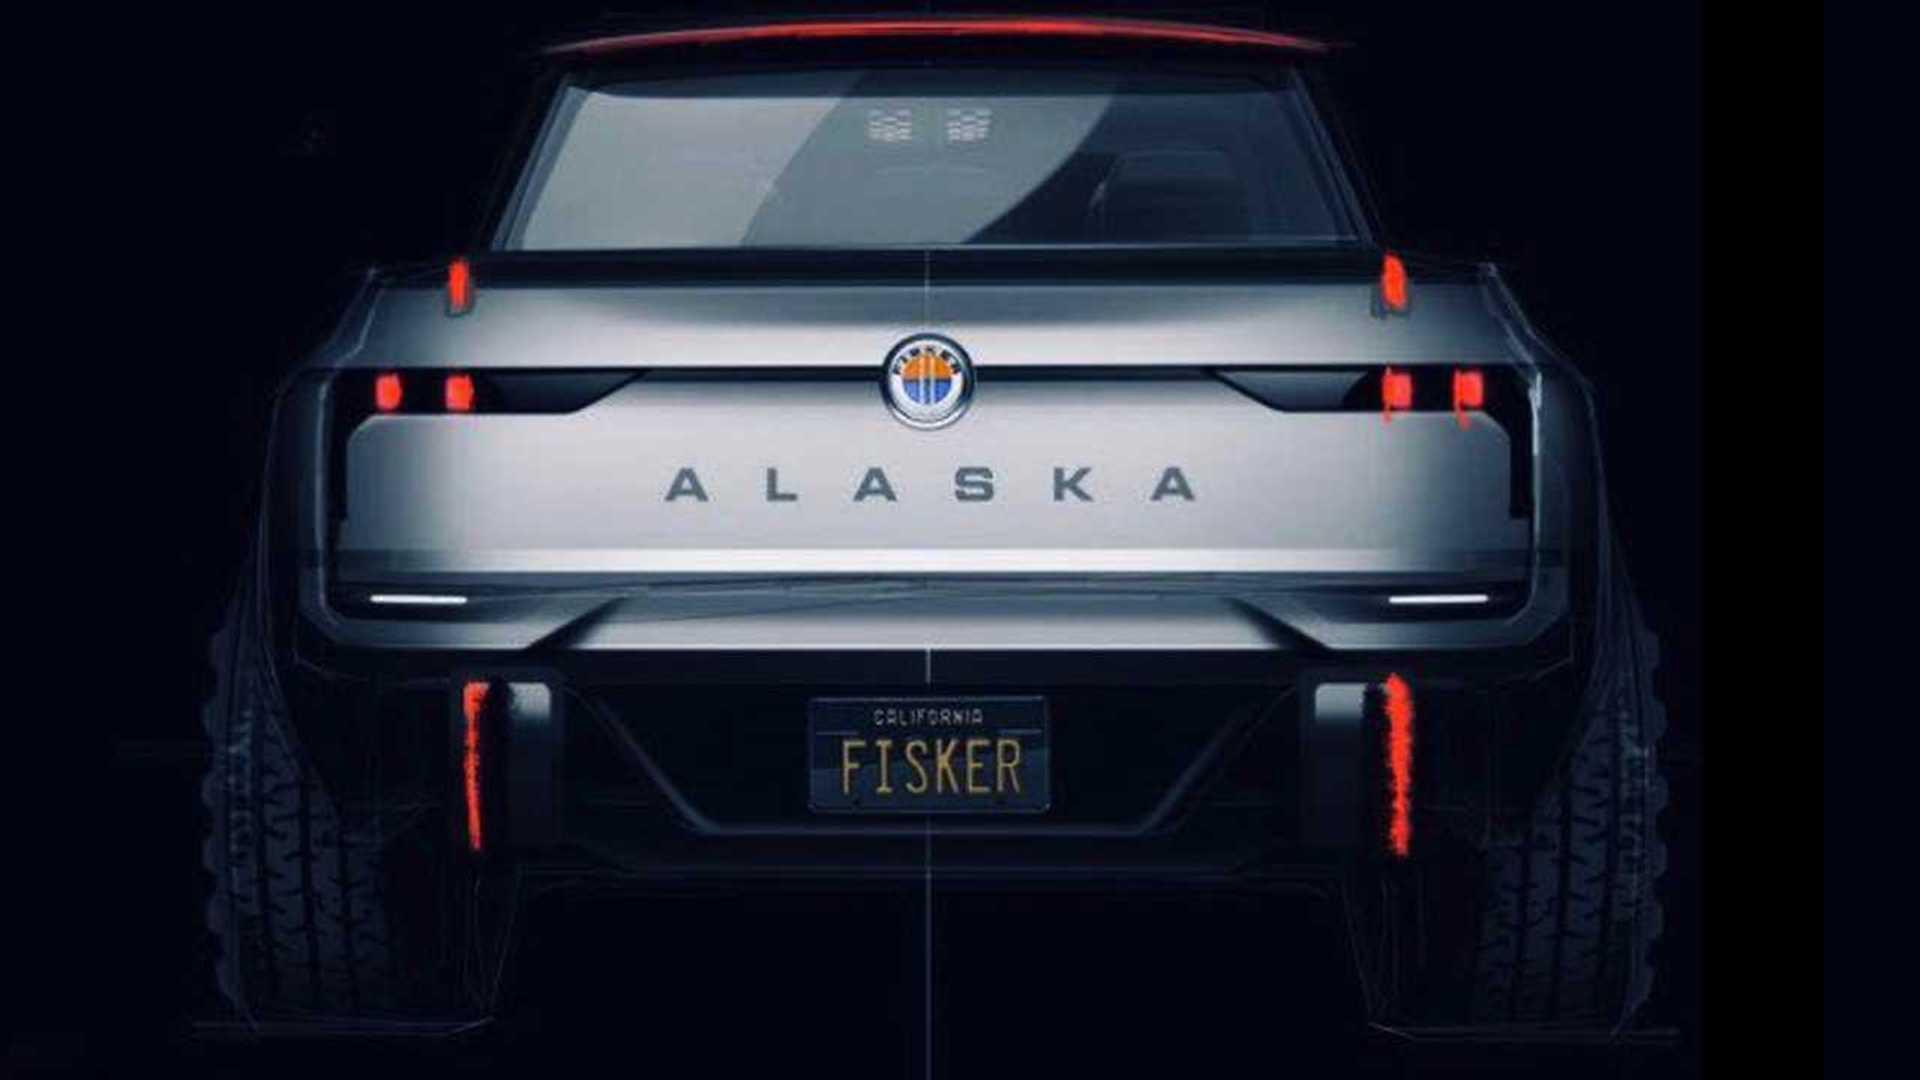 Fisker Alaska (Pick up) 4